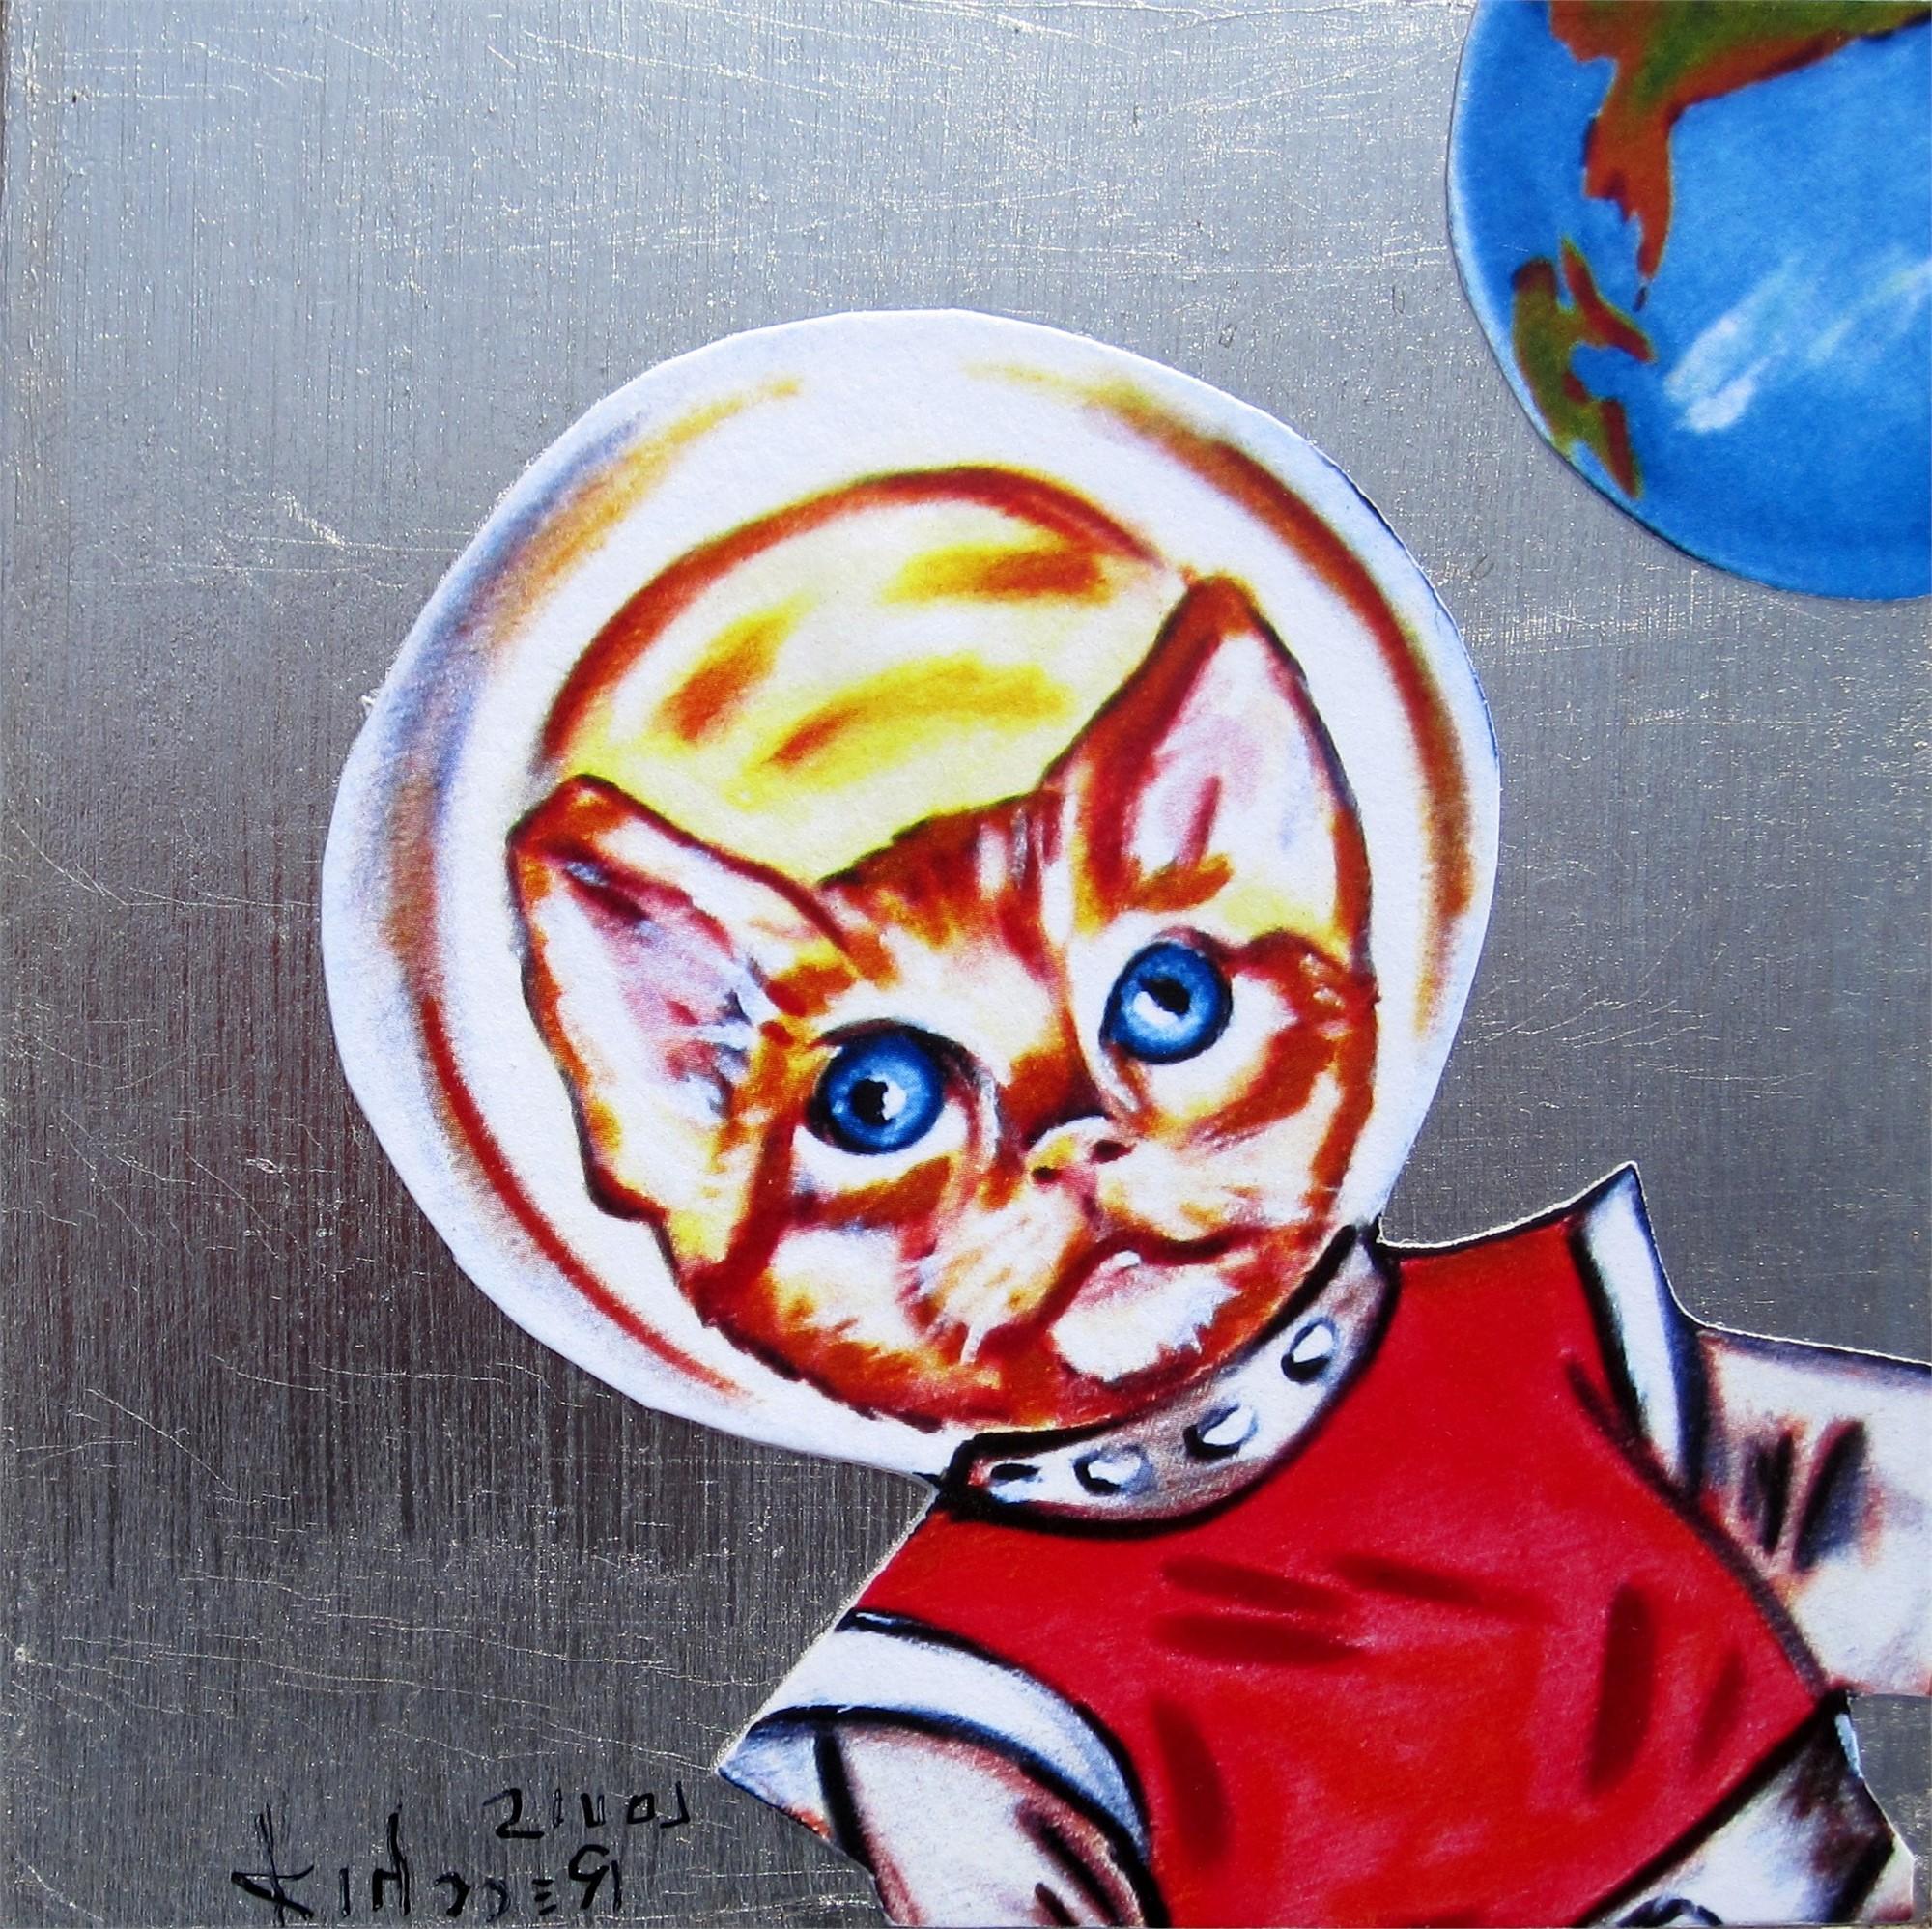 Space Cat by Louis Recchia